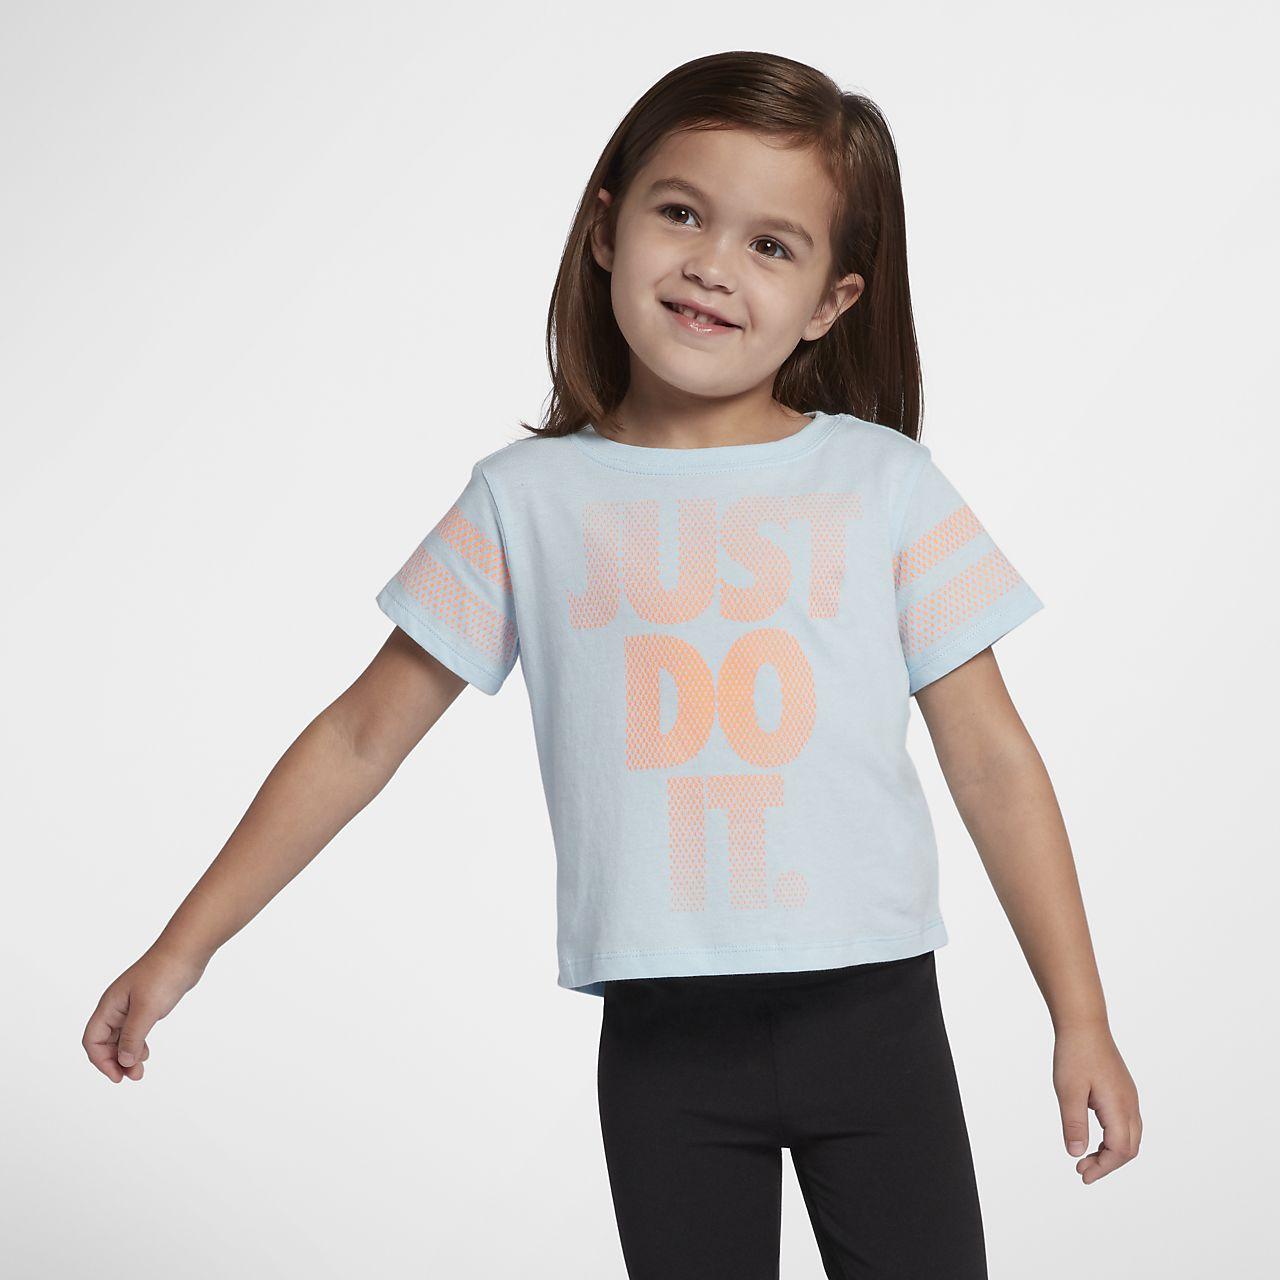 Tee-shirt Nike Sportswear Just Do It pour Jeune fille